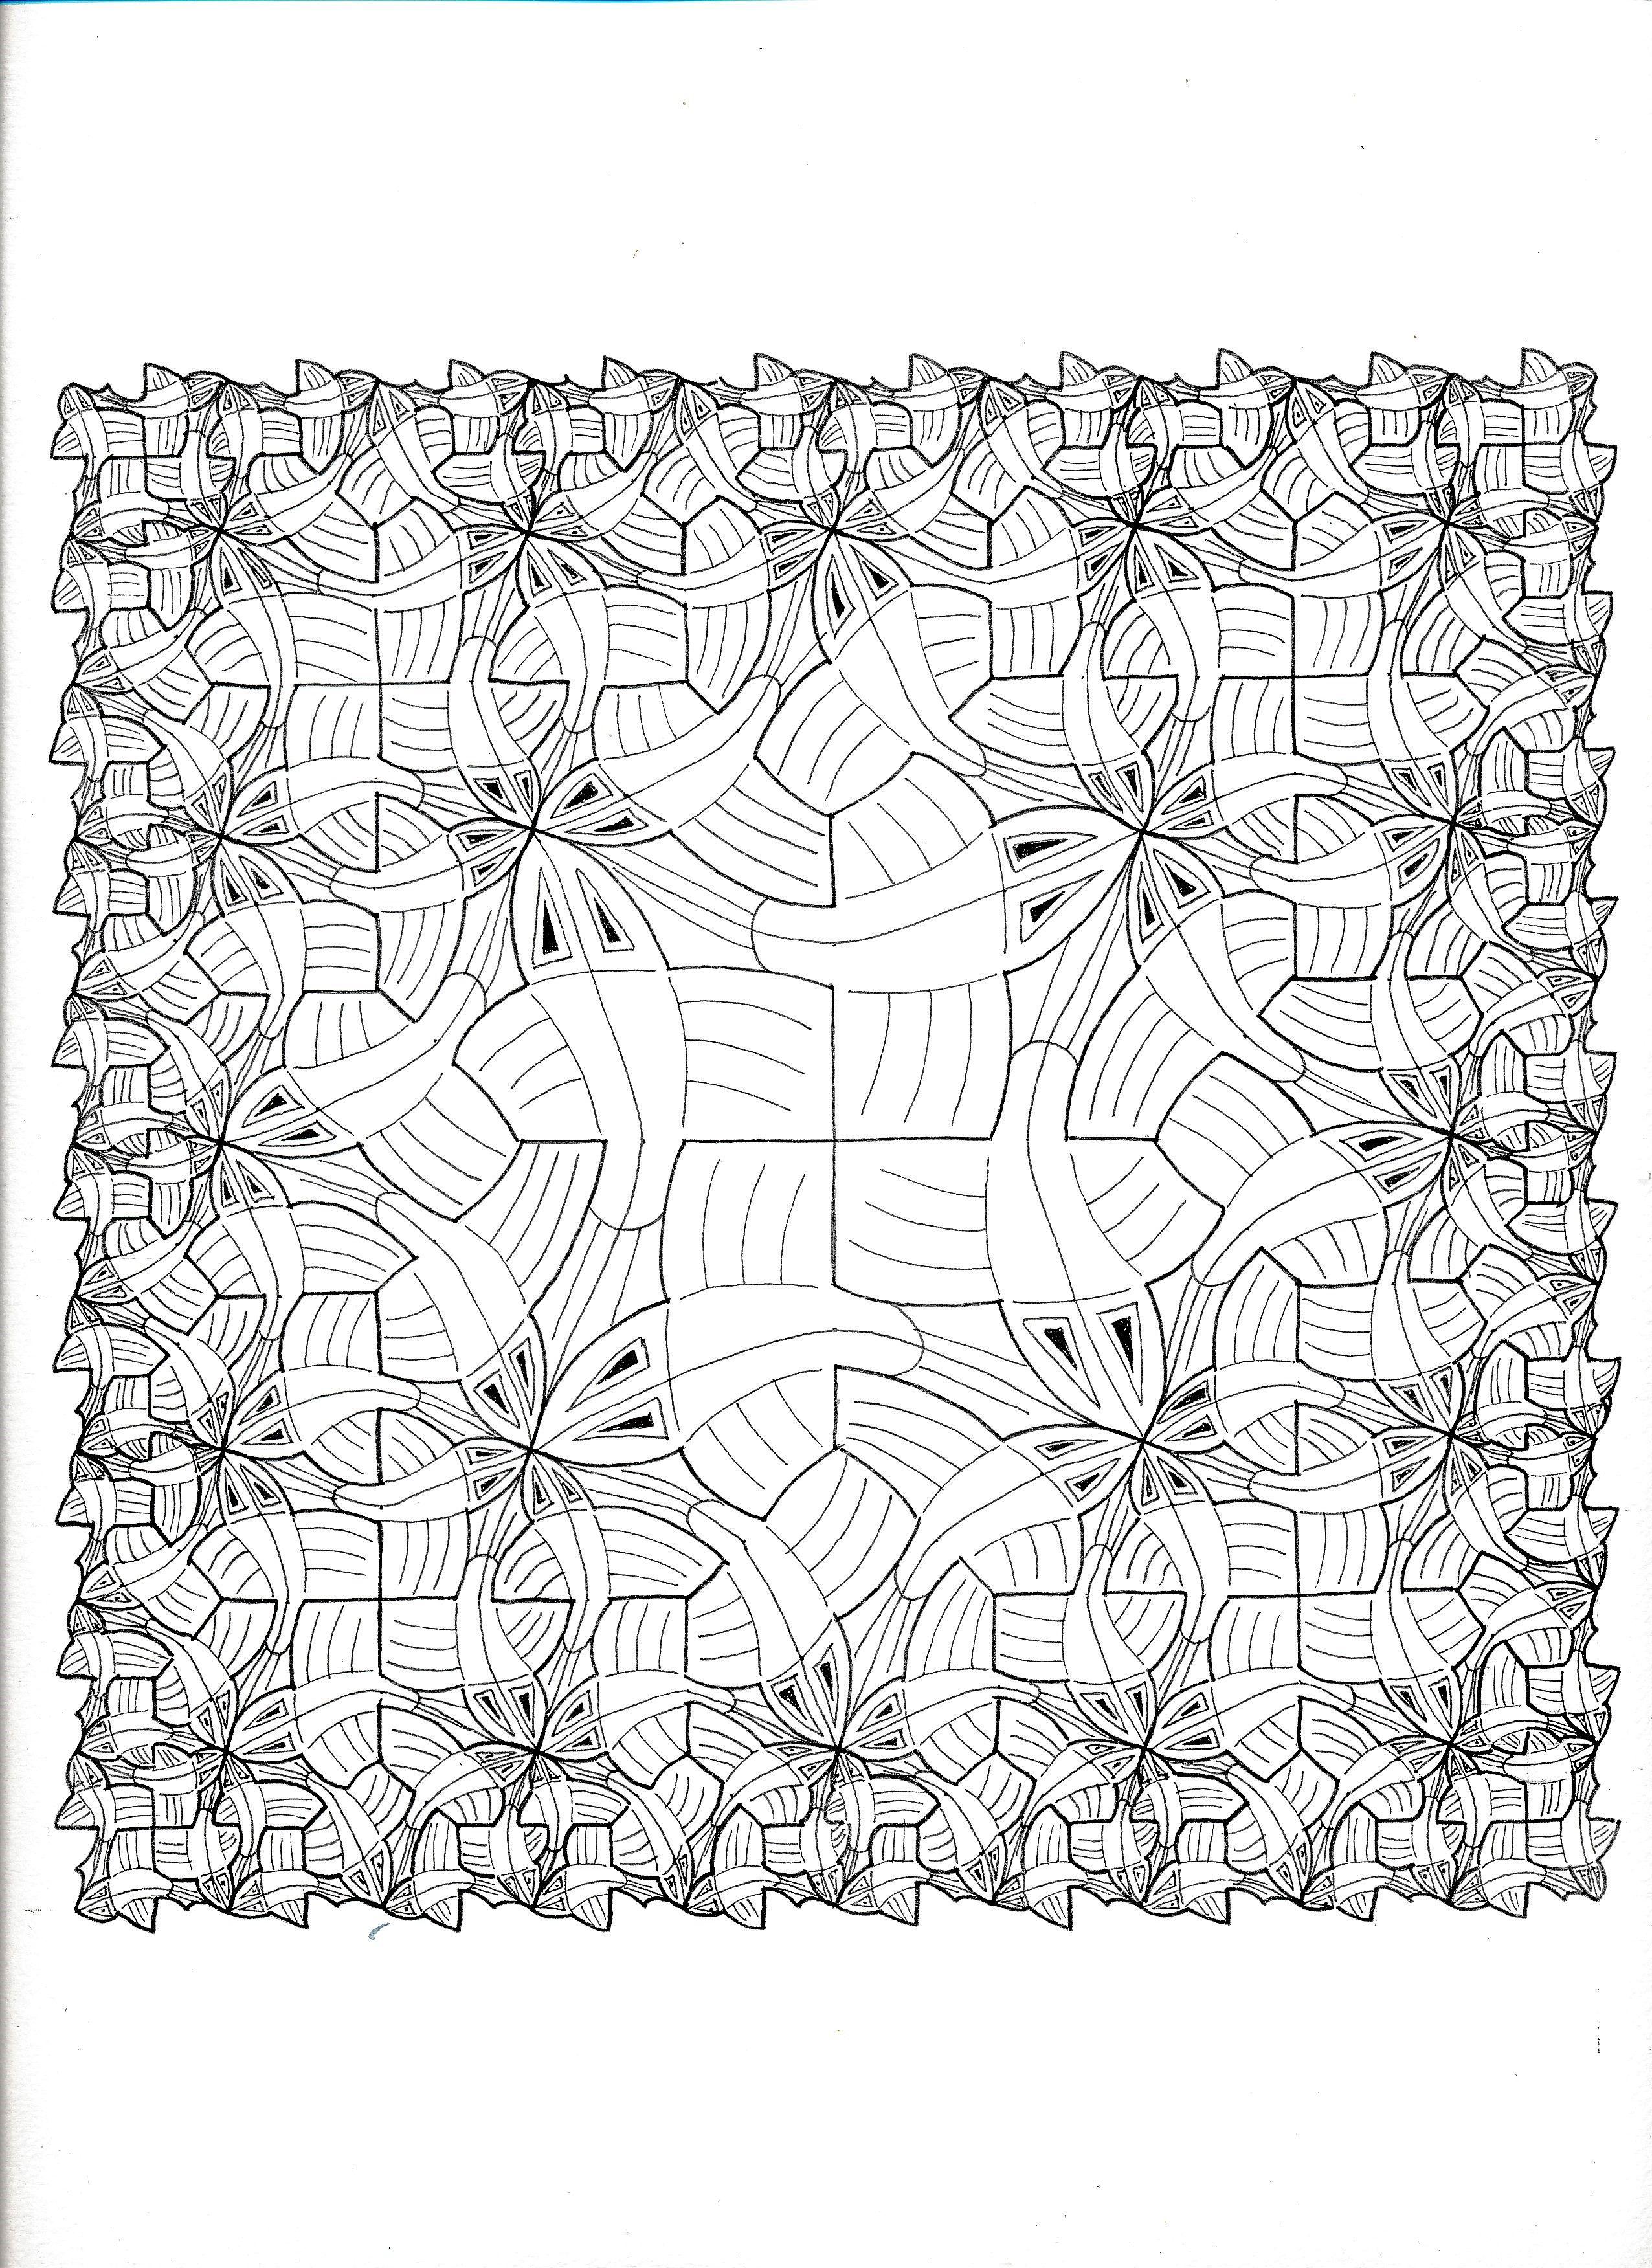 MC Escher 120 Symmetry Geometry Pattern Tessellation Mathart Regolo54 Ink Tiling Handmade Square Triangle